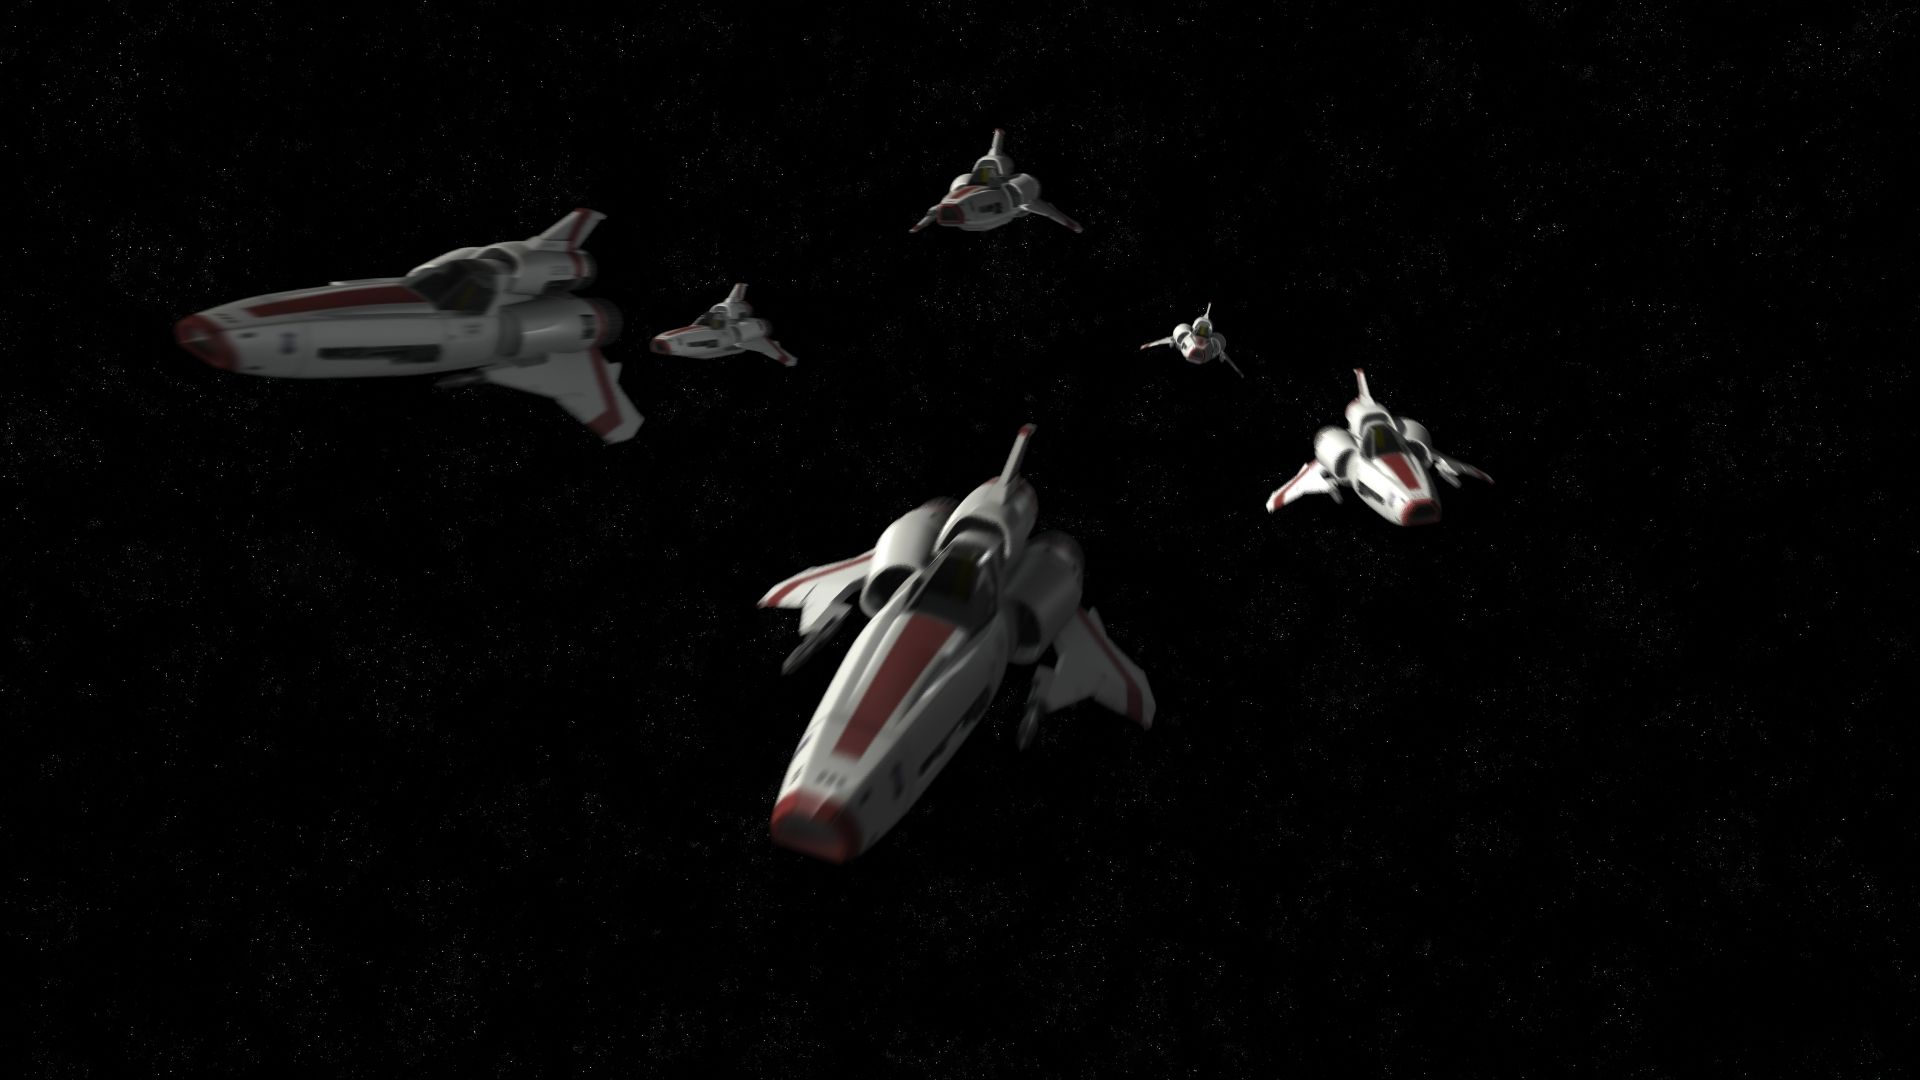 Galactica Battlestar Galactica Drama Latest Hd Wallpapers